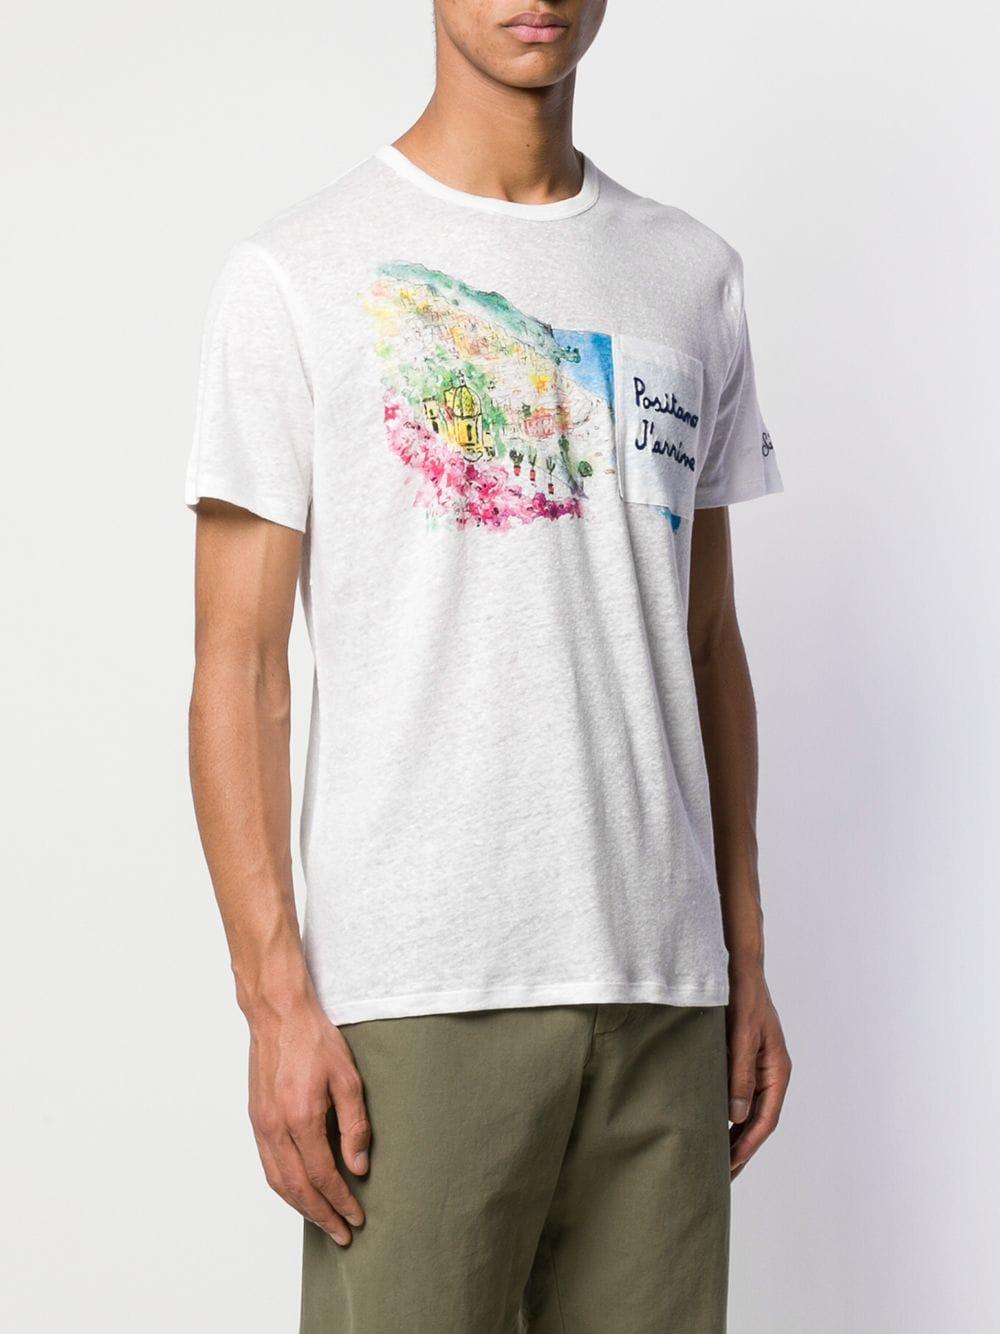 T-shirt in lino bianco con Positano ricamata MC2 | Maglieria Moda | ECSTASEA-EMB POSITANO01